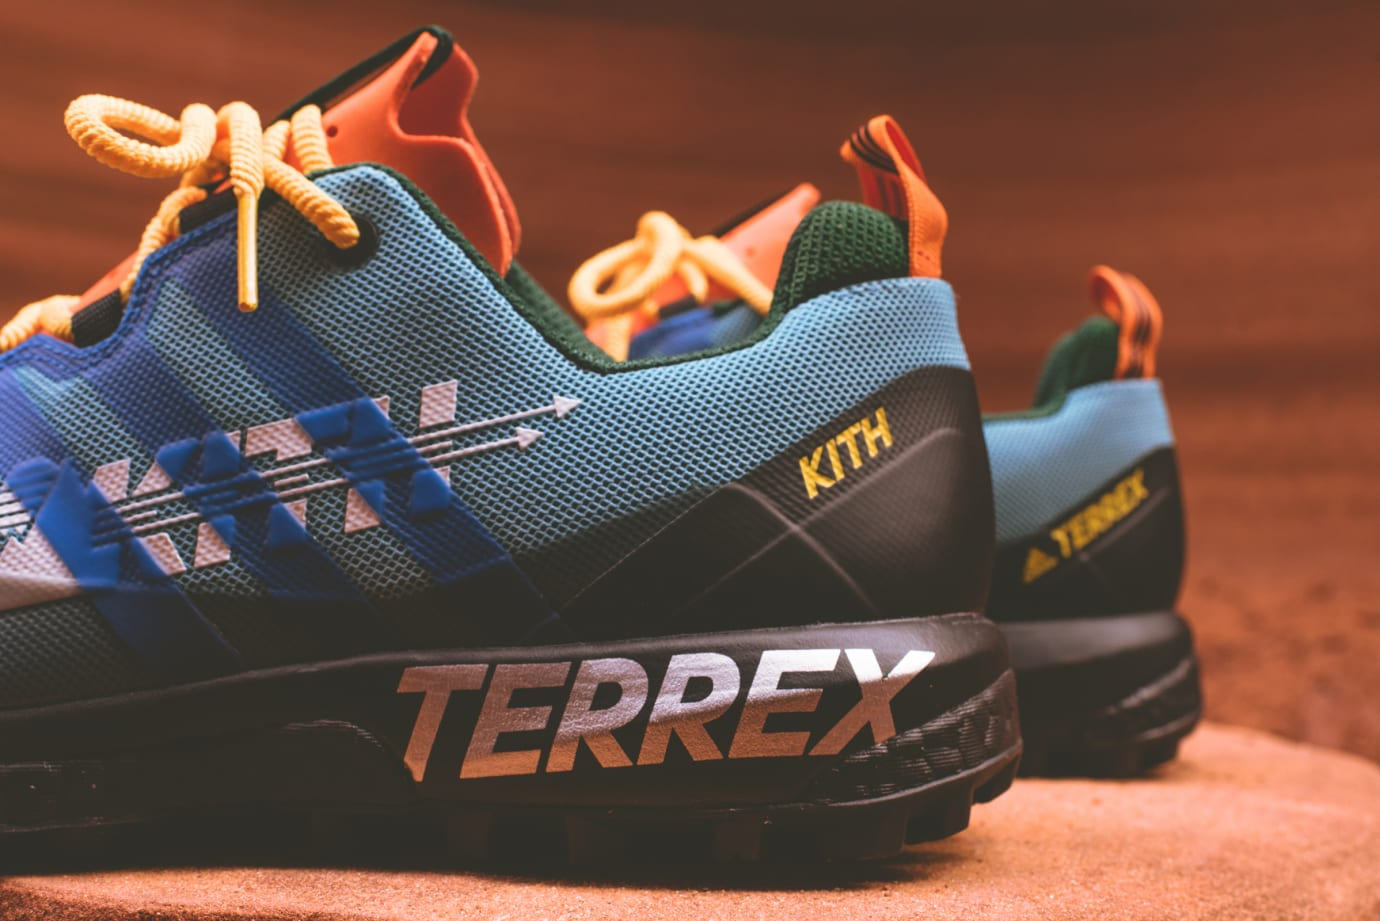 6b4def22 Kith x Adidas Terrex Agravic GTX (Detail) Image via Kith Kith x Adidas  Terrex Response TR Boost ...